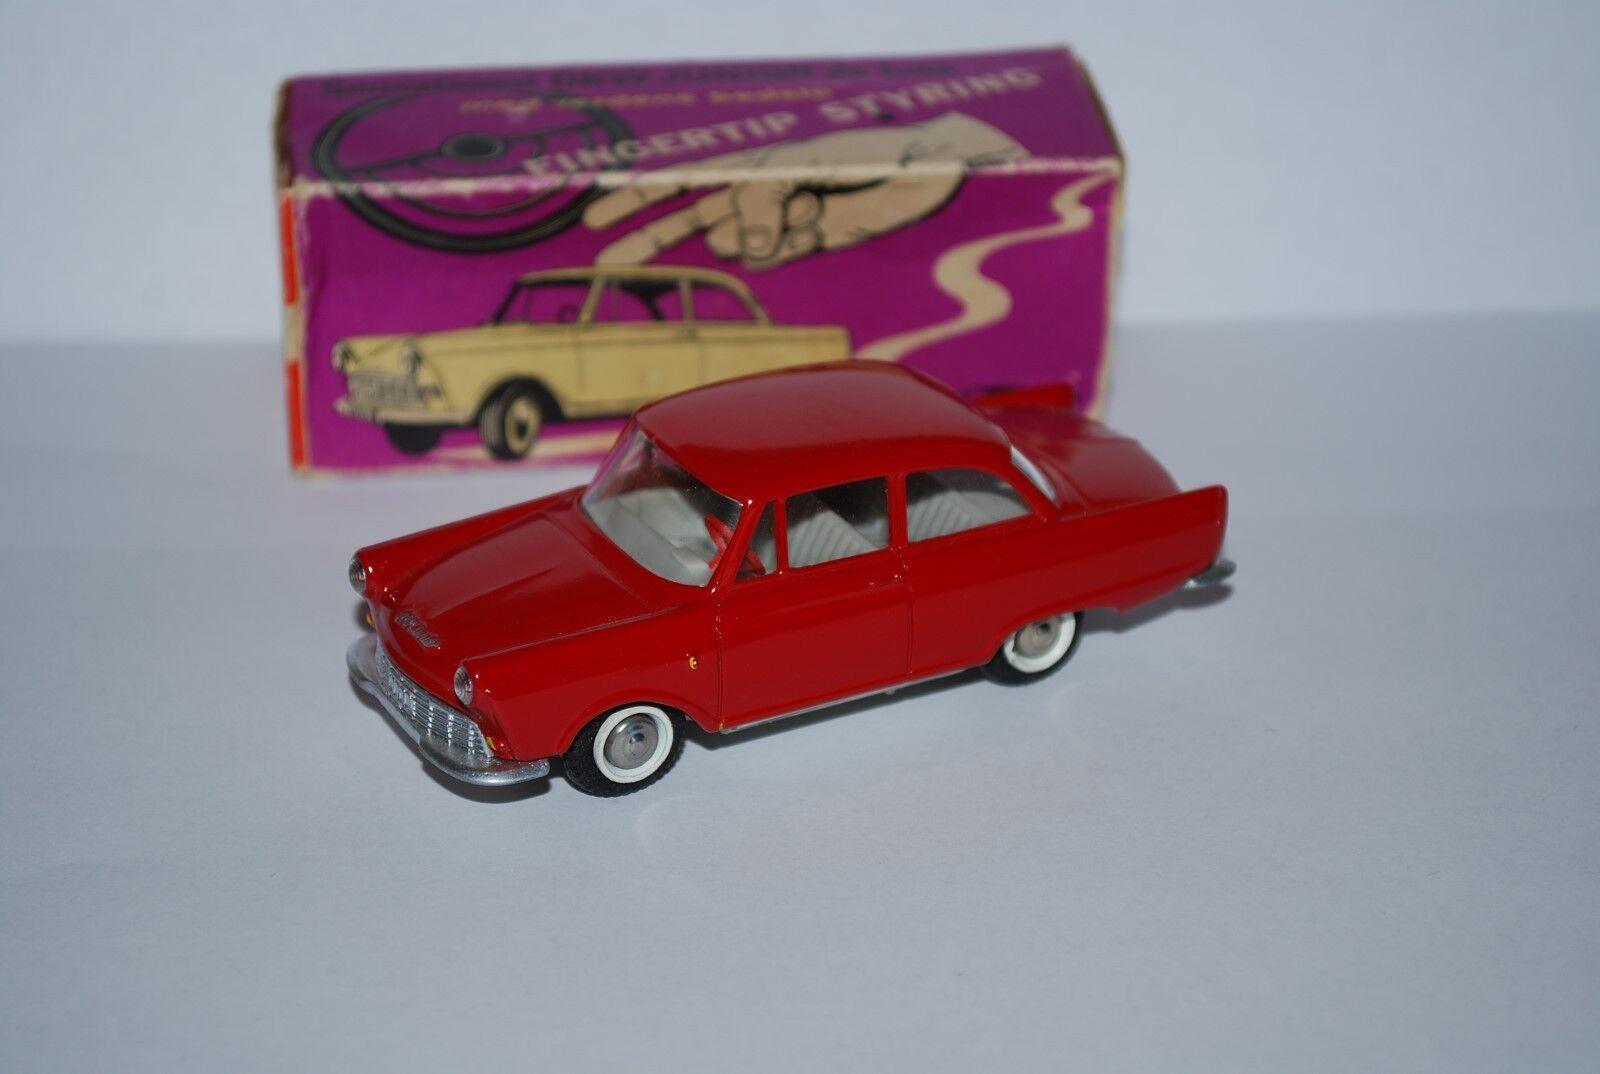 TEKNOI DKW JUNIOR DE LUXE ROUGE REF 727 NEUVE BOITE NEW BOX  SCALE 1 43